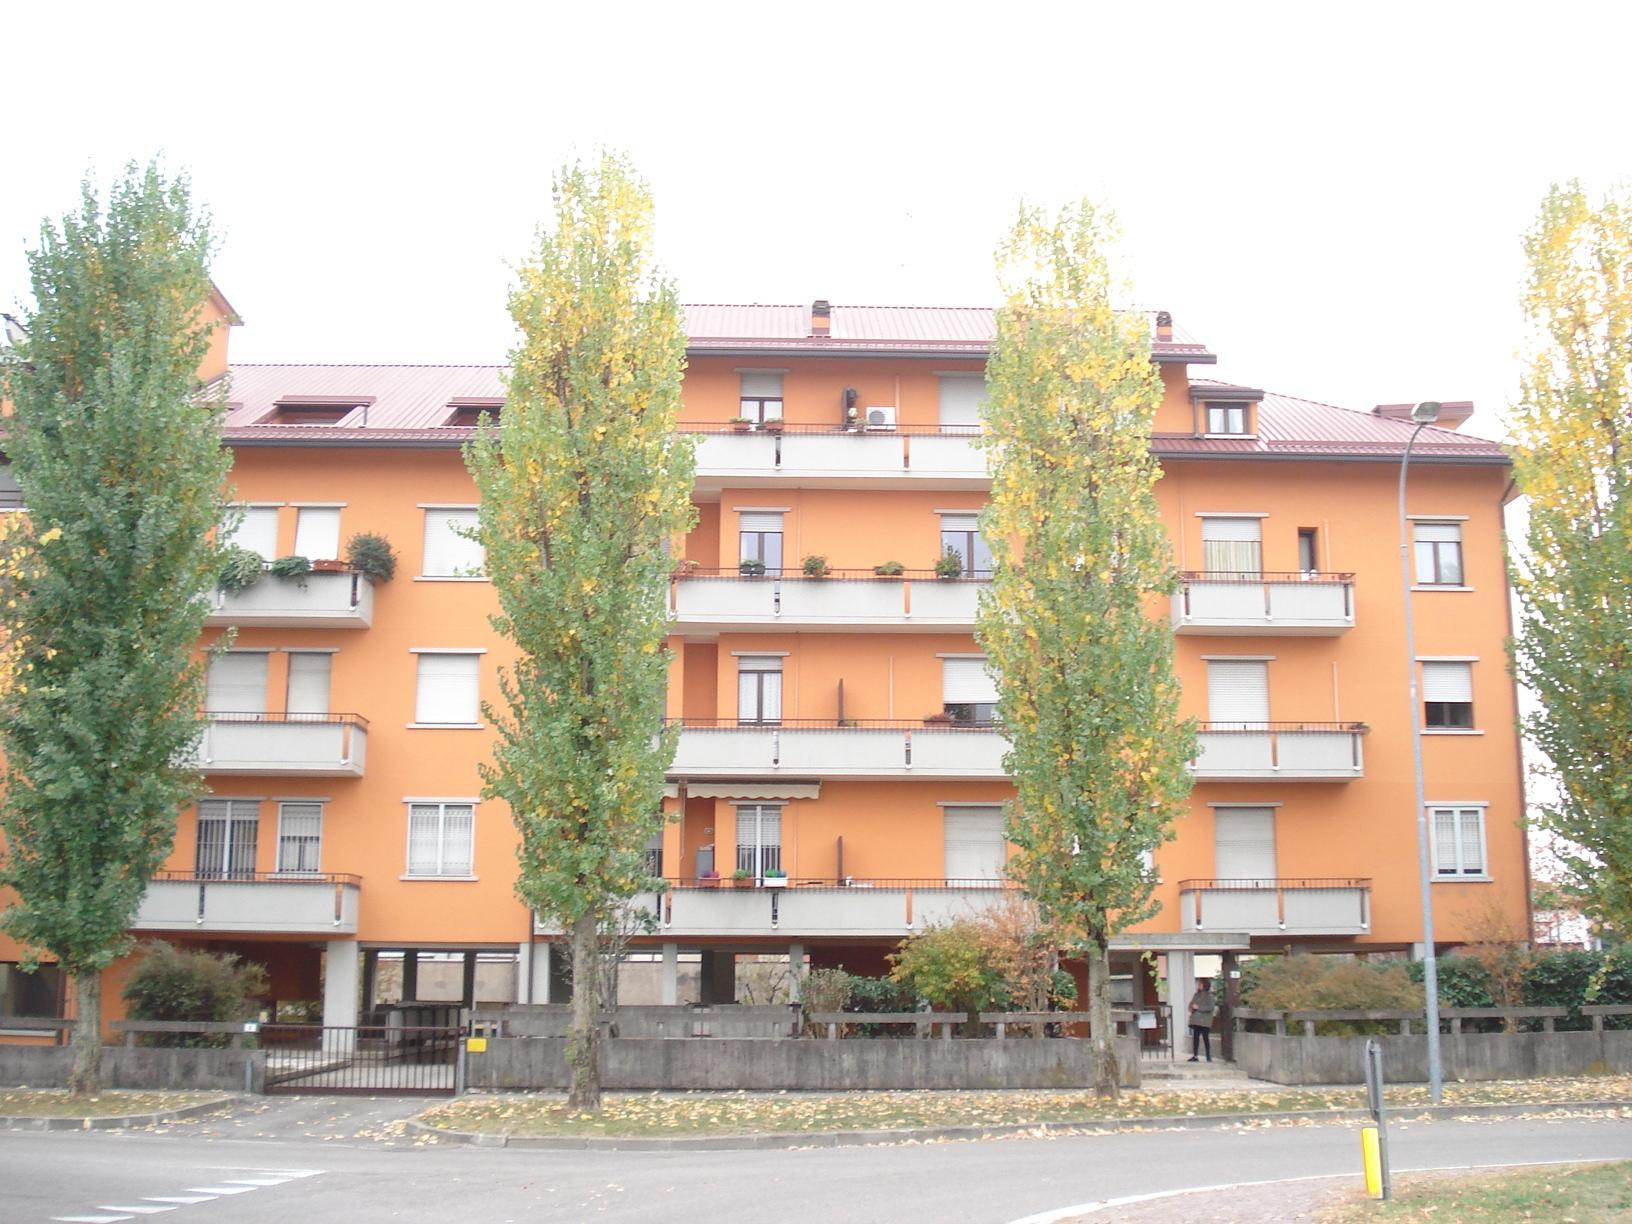 Parabiago   Appartamento in Vendita in Via 5 Giornate   lacasadimilano.it